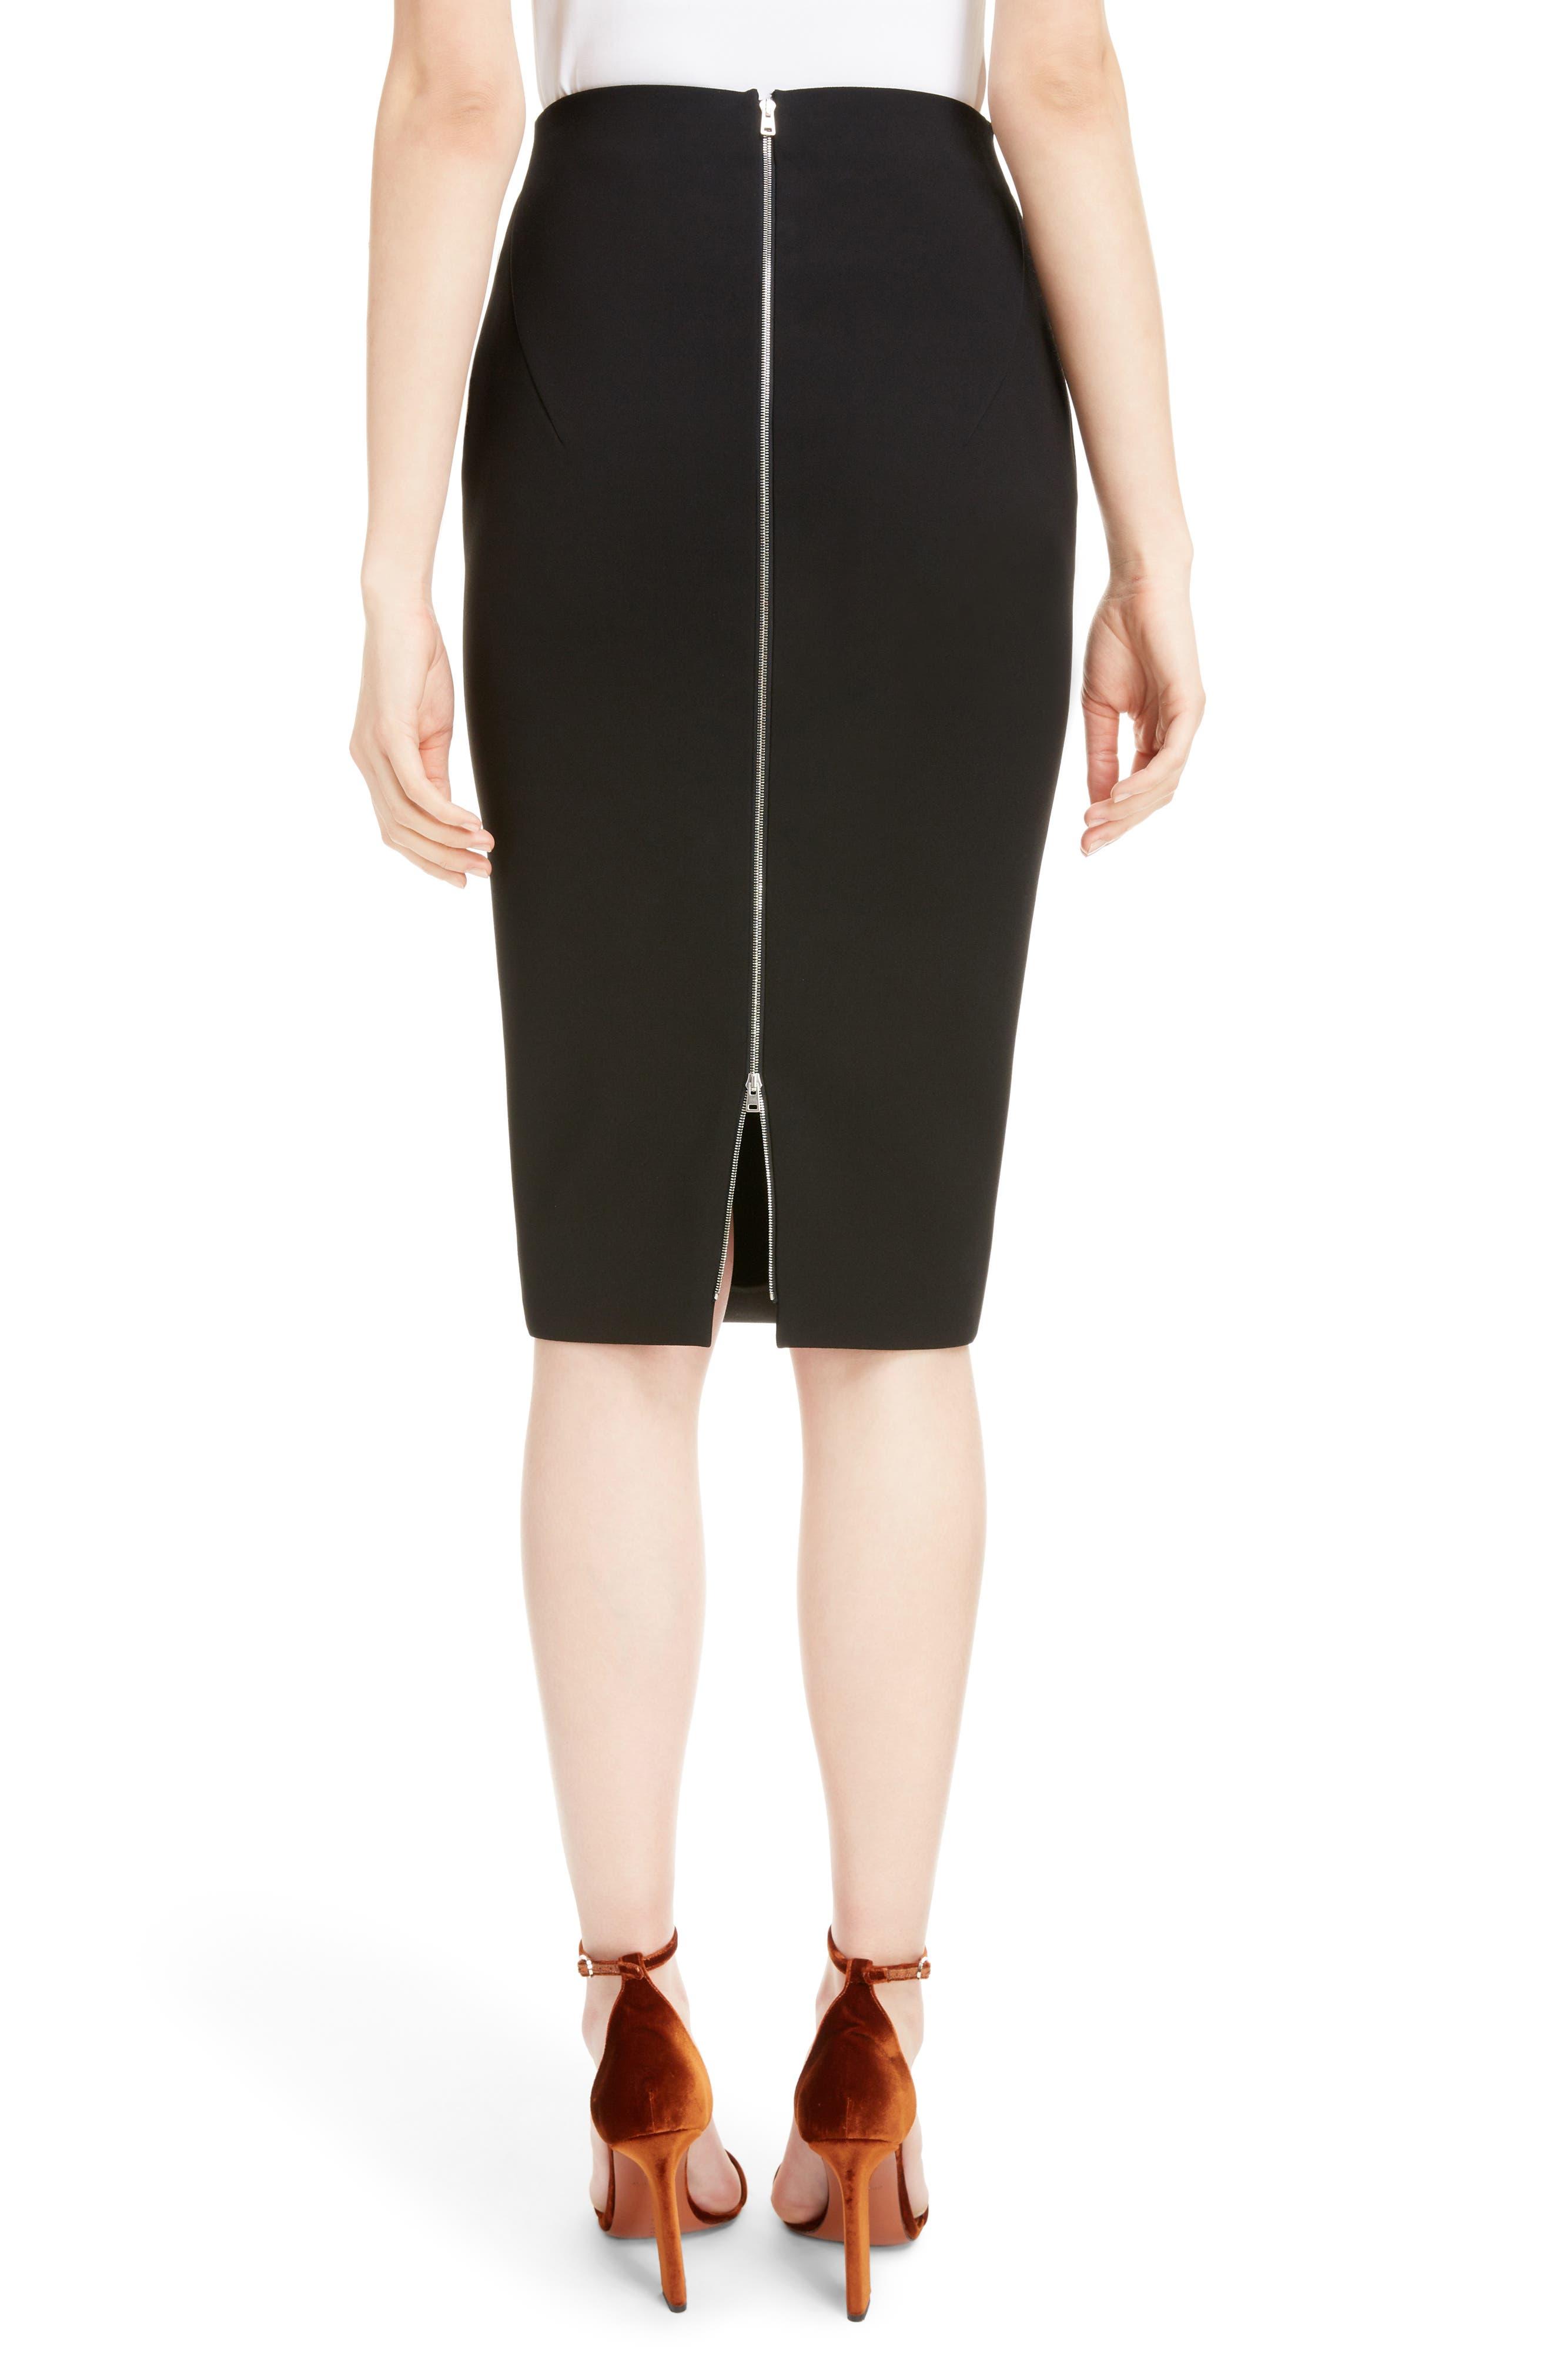 VICTORIA BECKHAM, Back Zip Pencil Skirt, Alternate thumbnail 2, color, BLACK